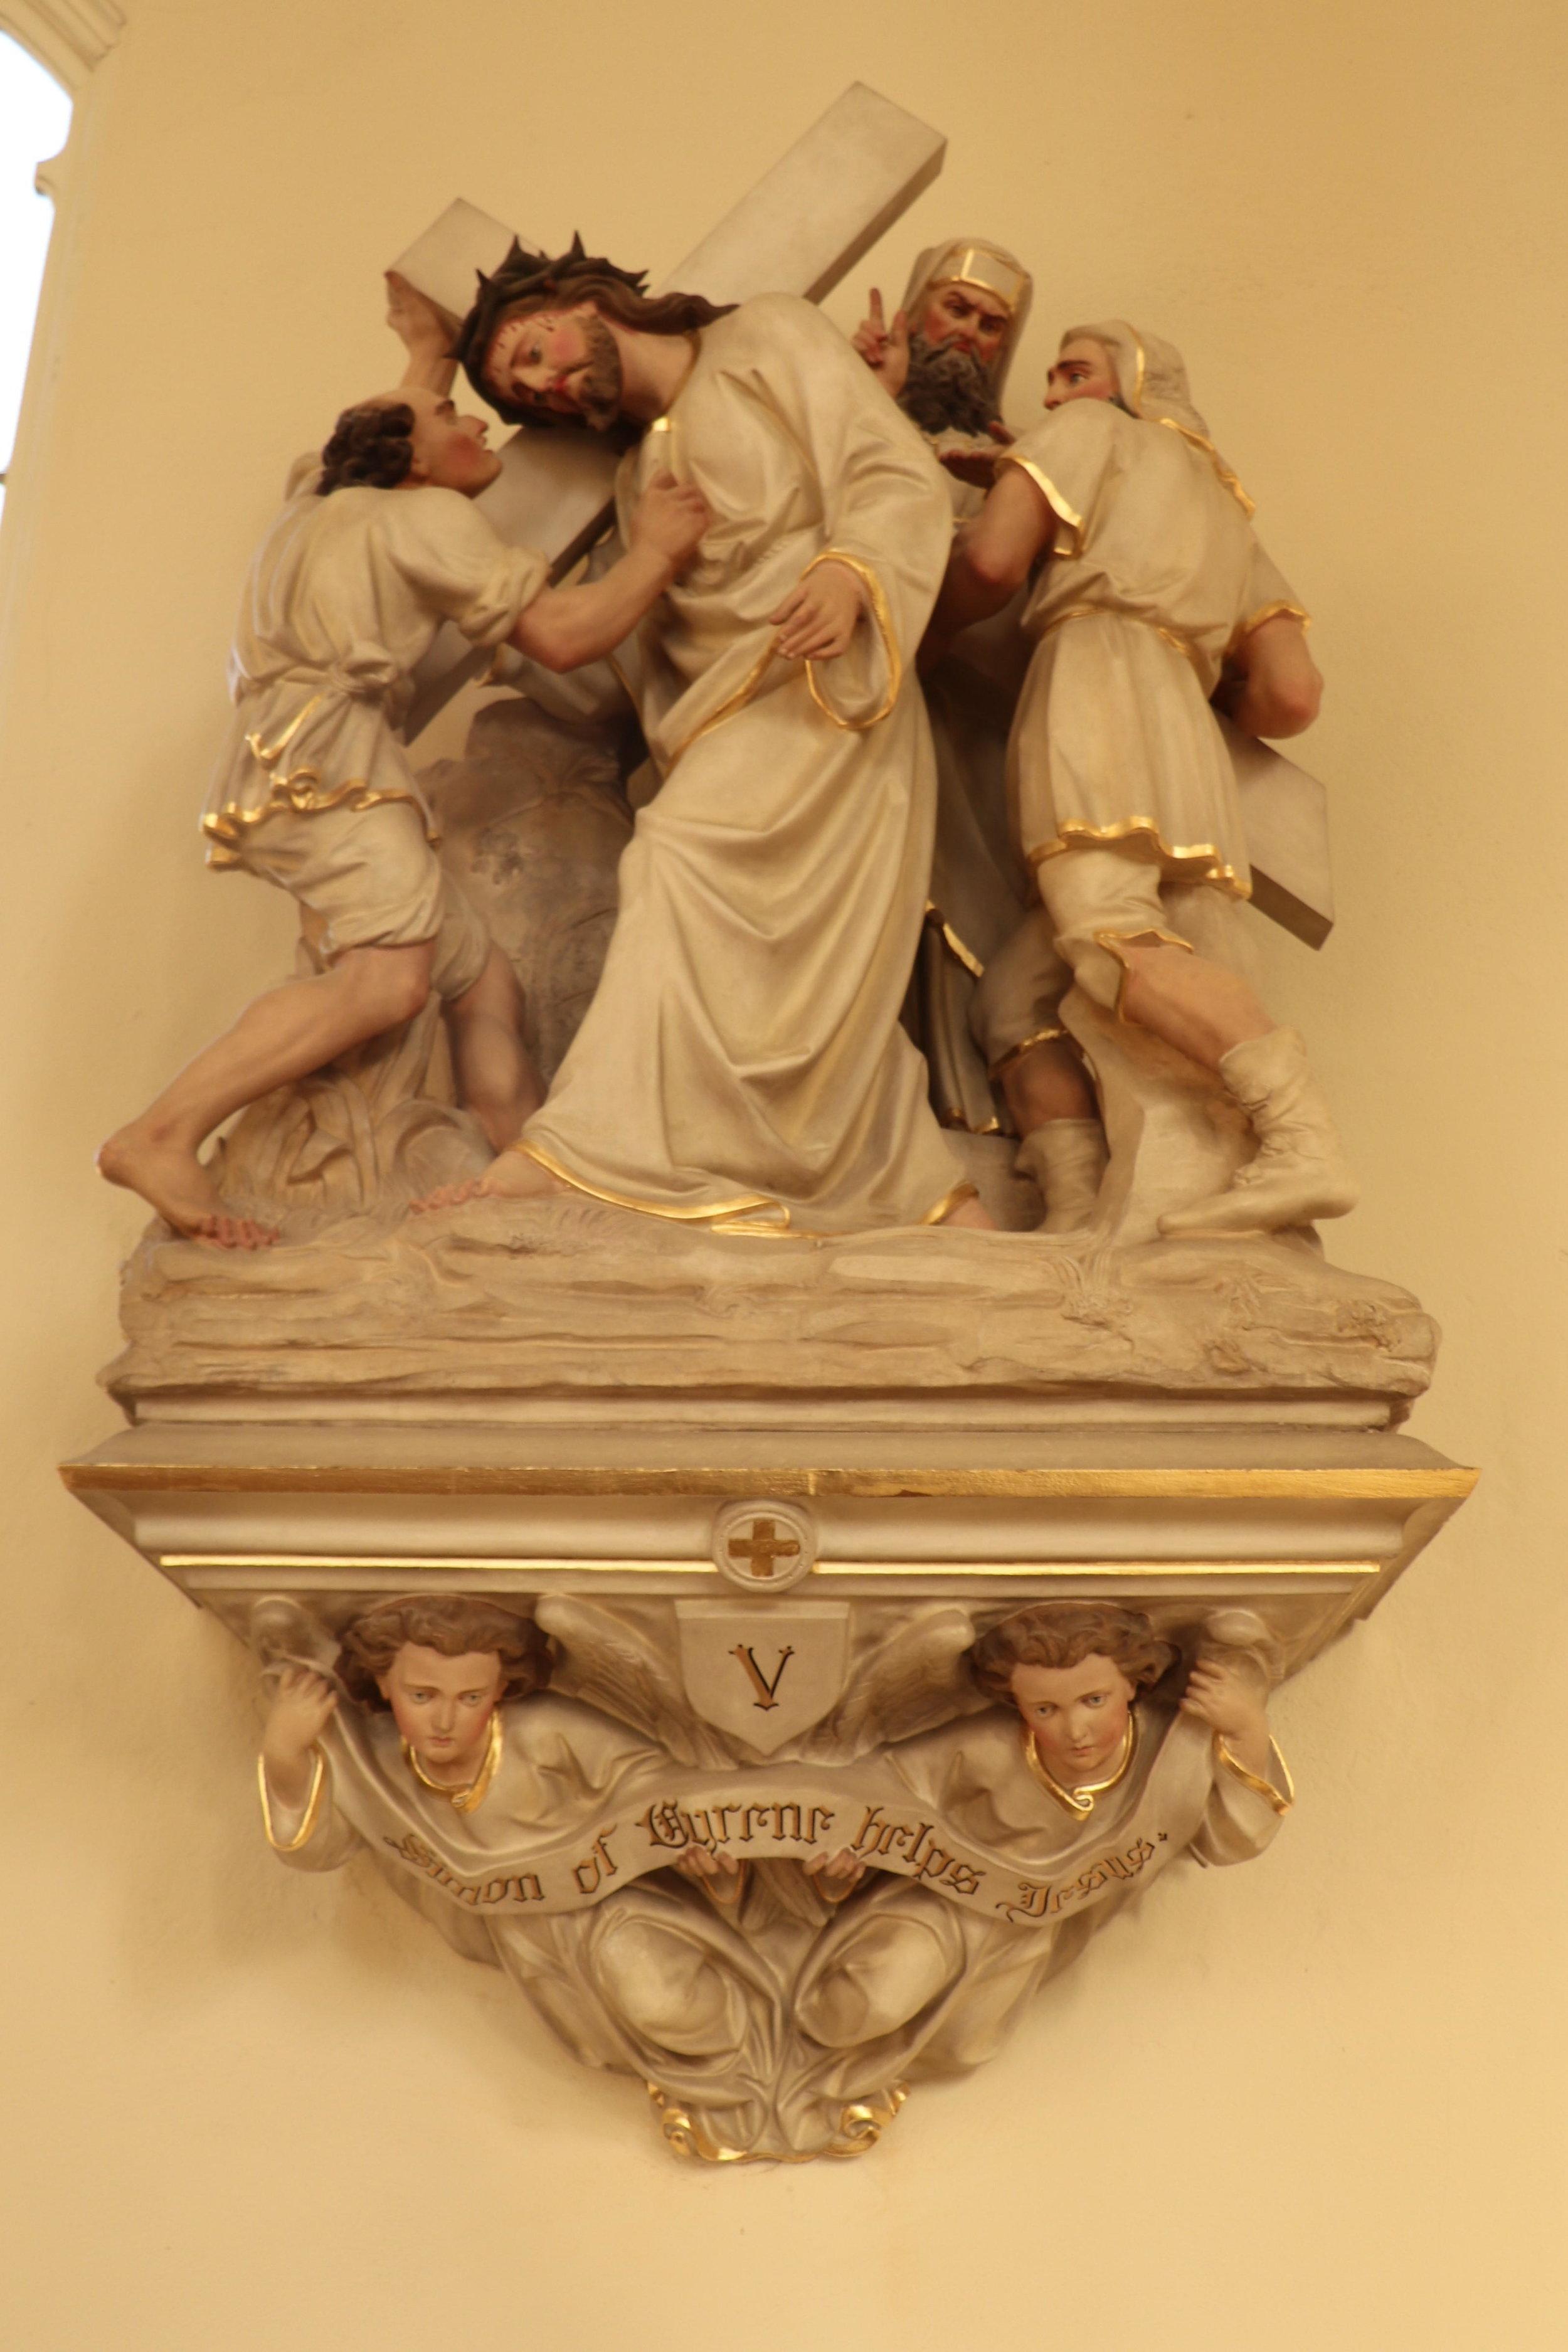 Simon helps Jesus with his Cross